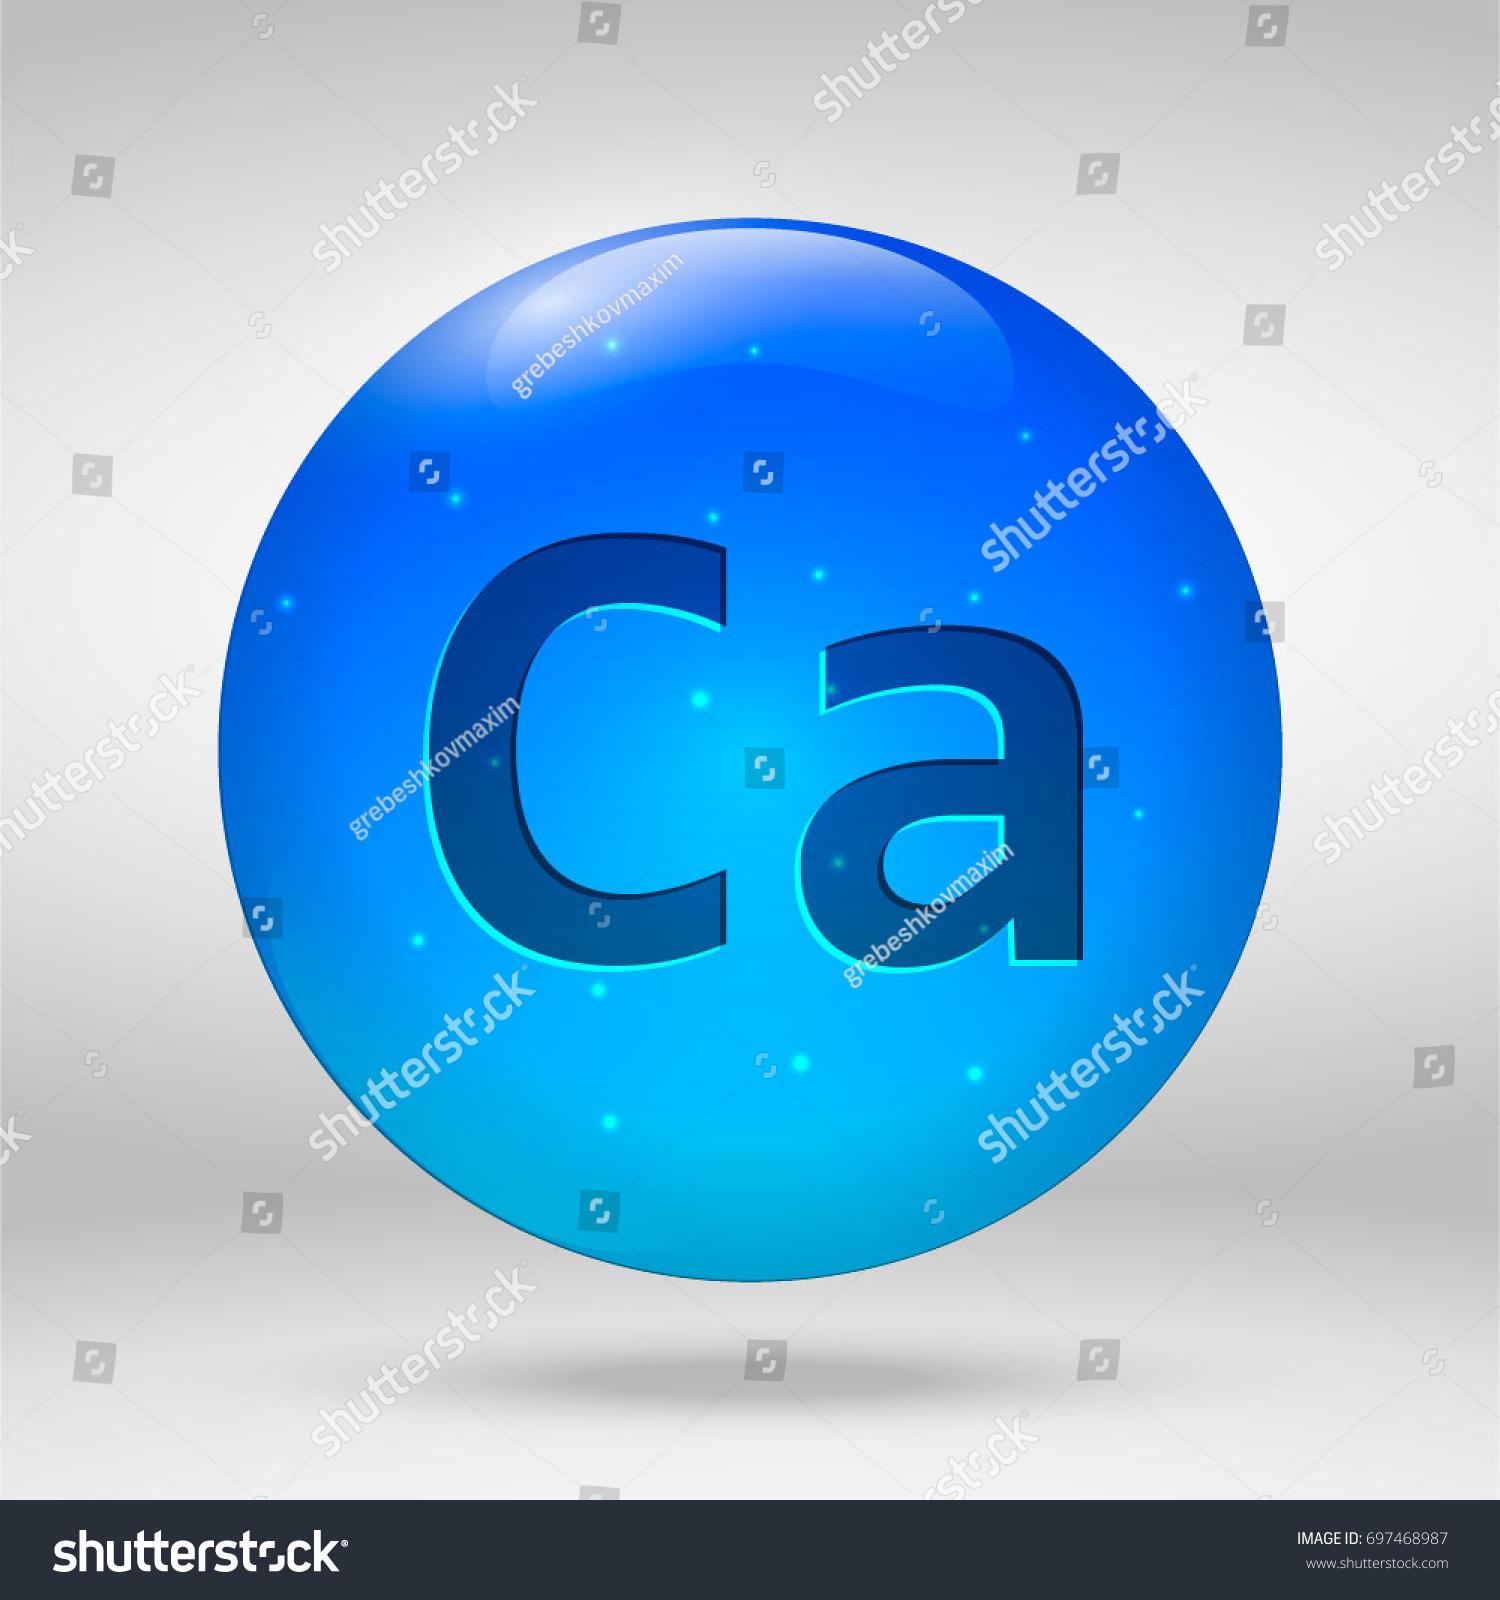 Calcium element periodic table vector 3d stock vector 697468987 calcium element of the periodic table vector 3d glossy drop pill capsule icon buycottarizona